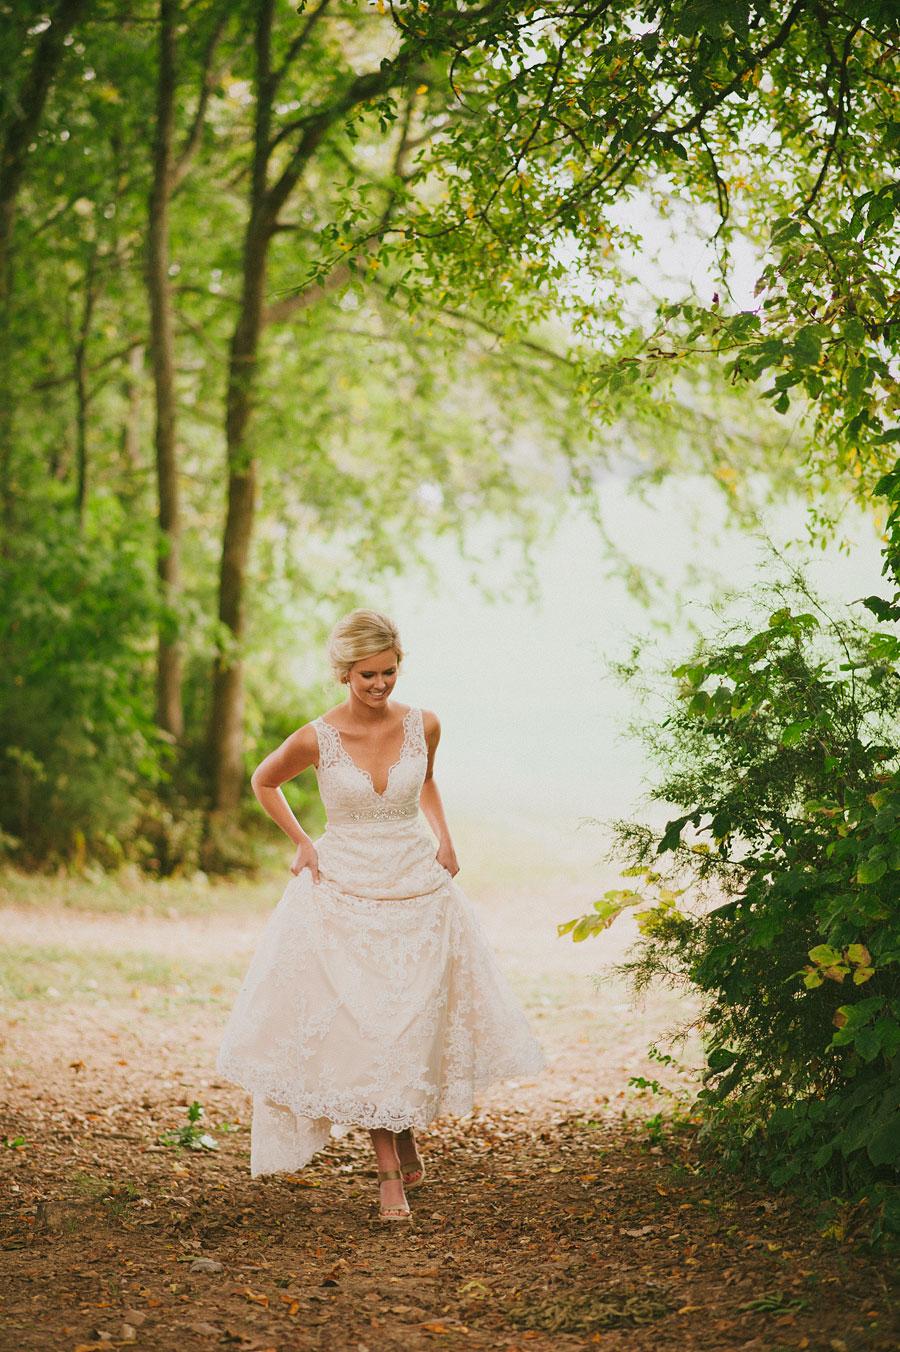 nashvillewedding_leipersforkwedding_farmwedding_bytheimageisfound_0040.jpg